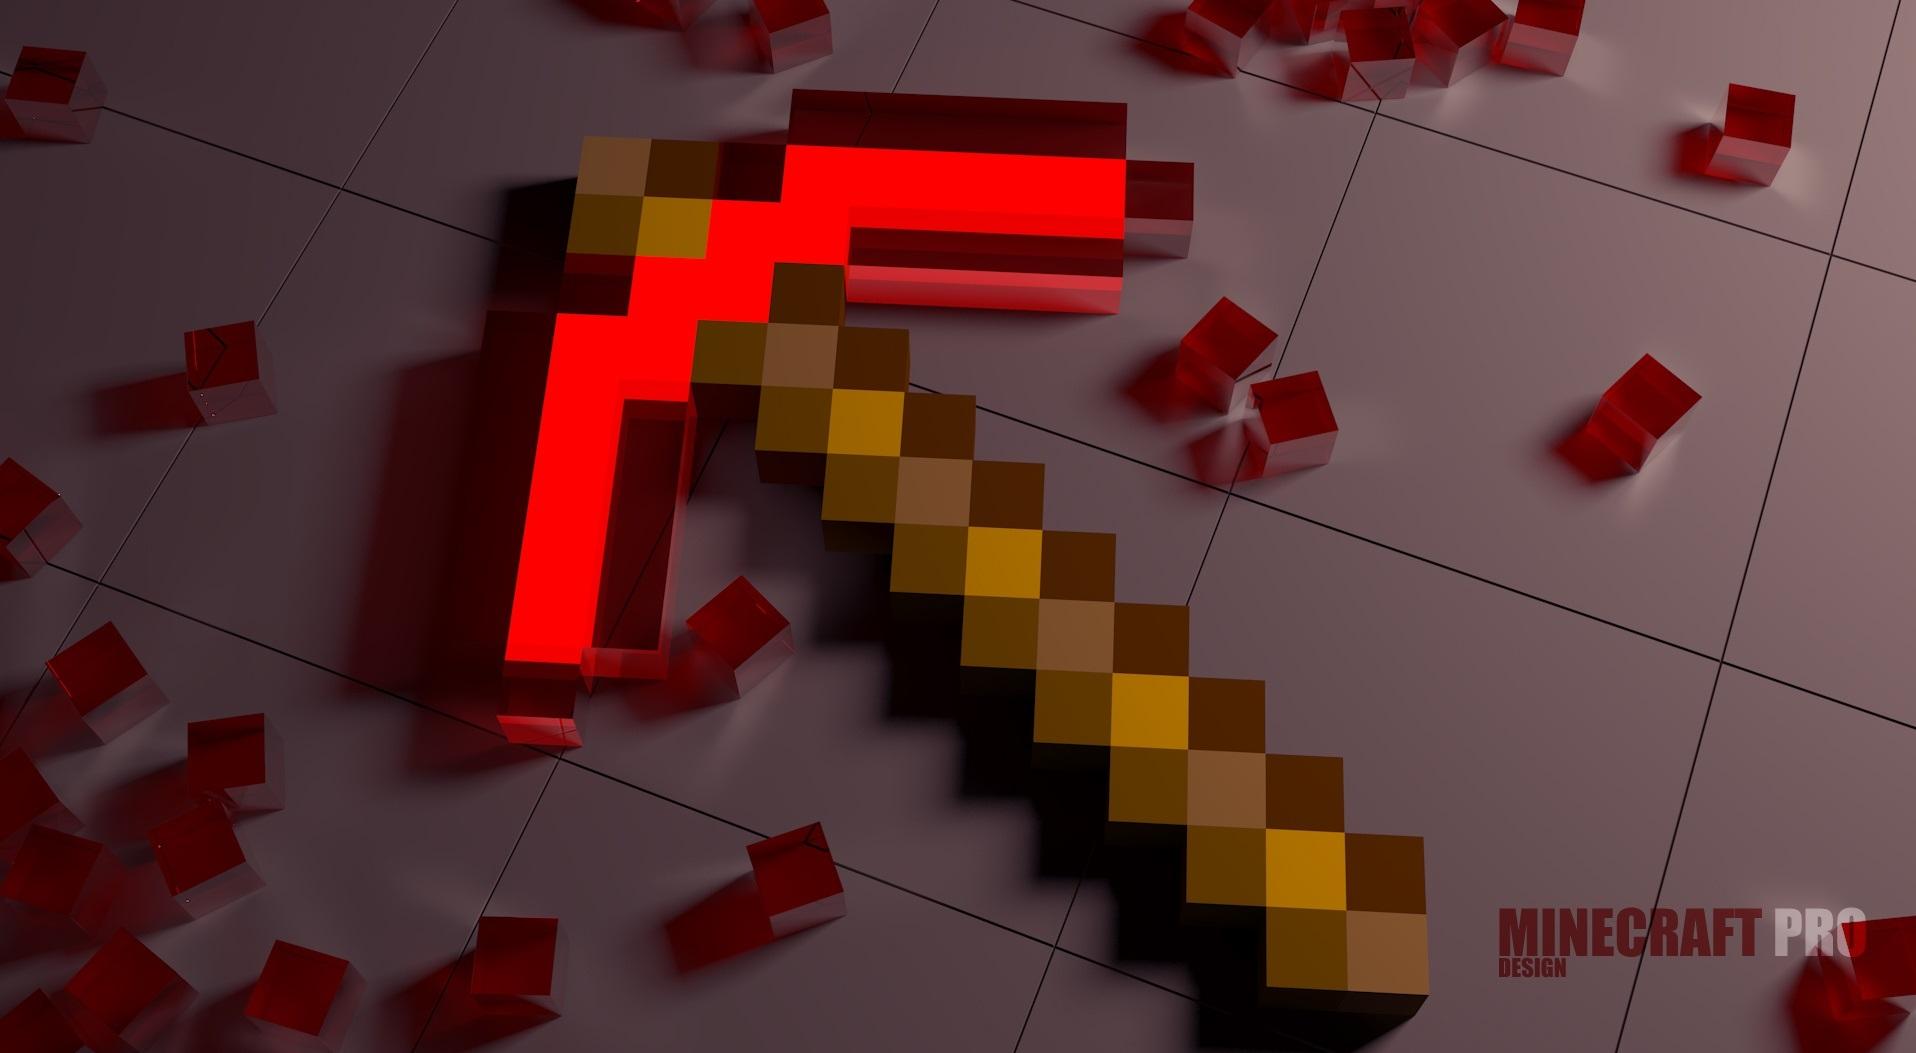 General 1916x1053 Minecraft game art artwork 3D Abstract